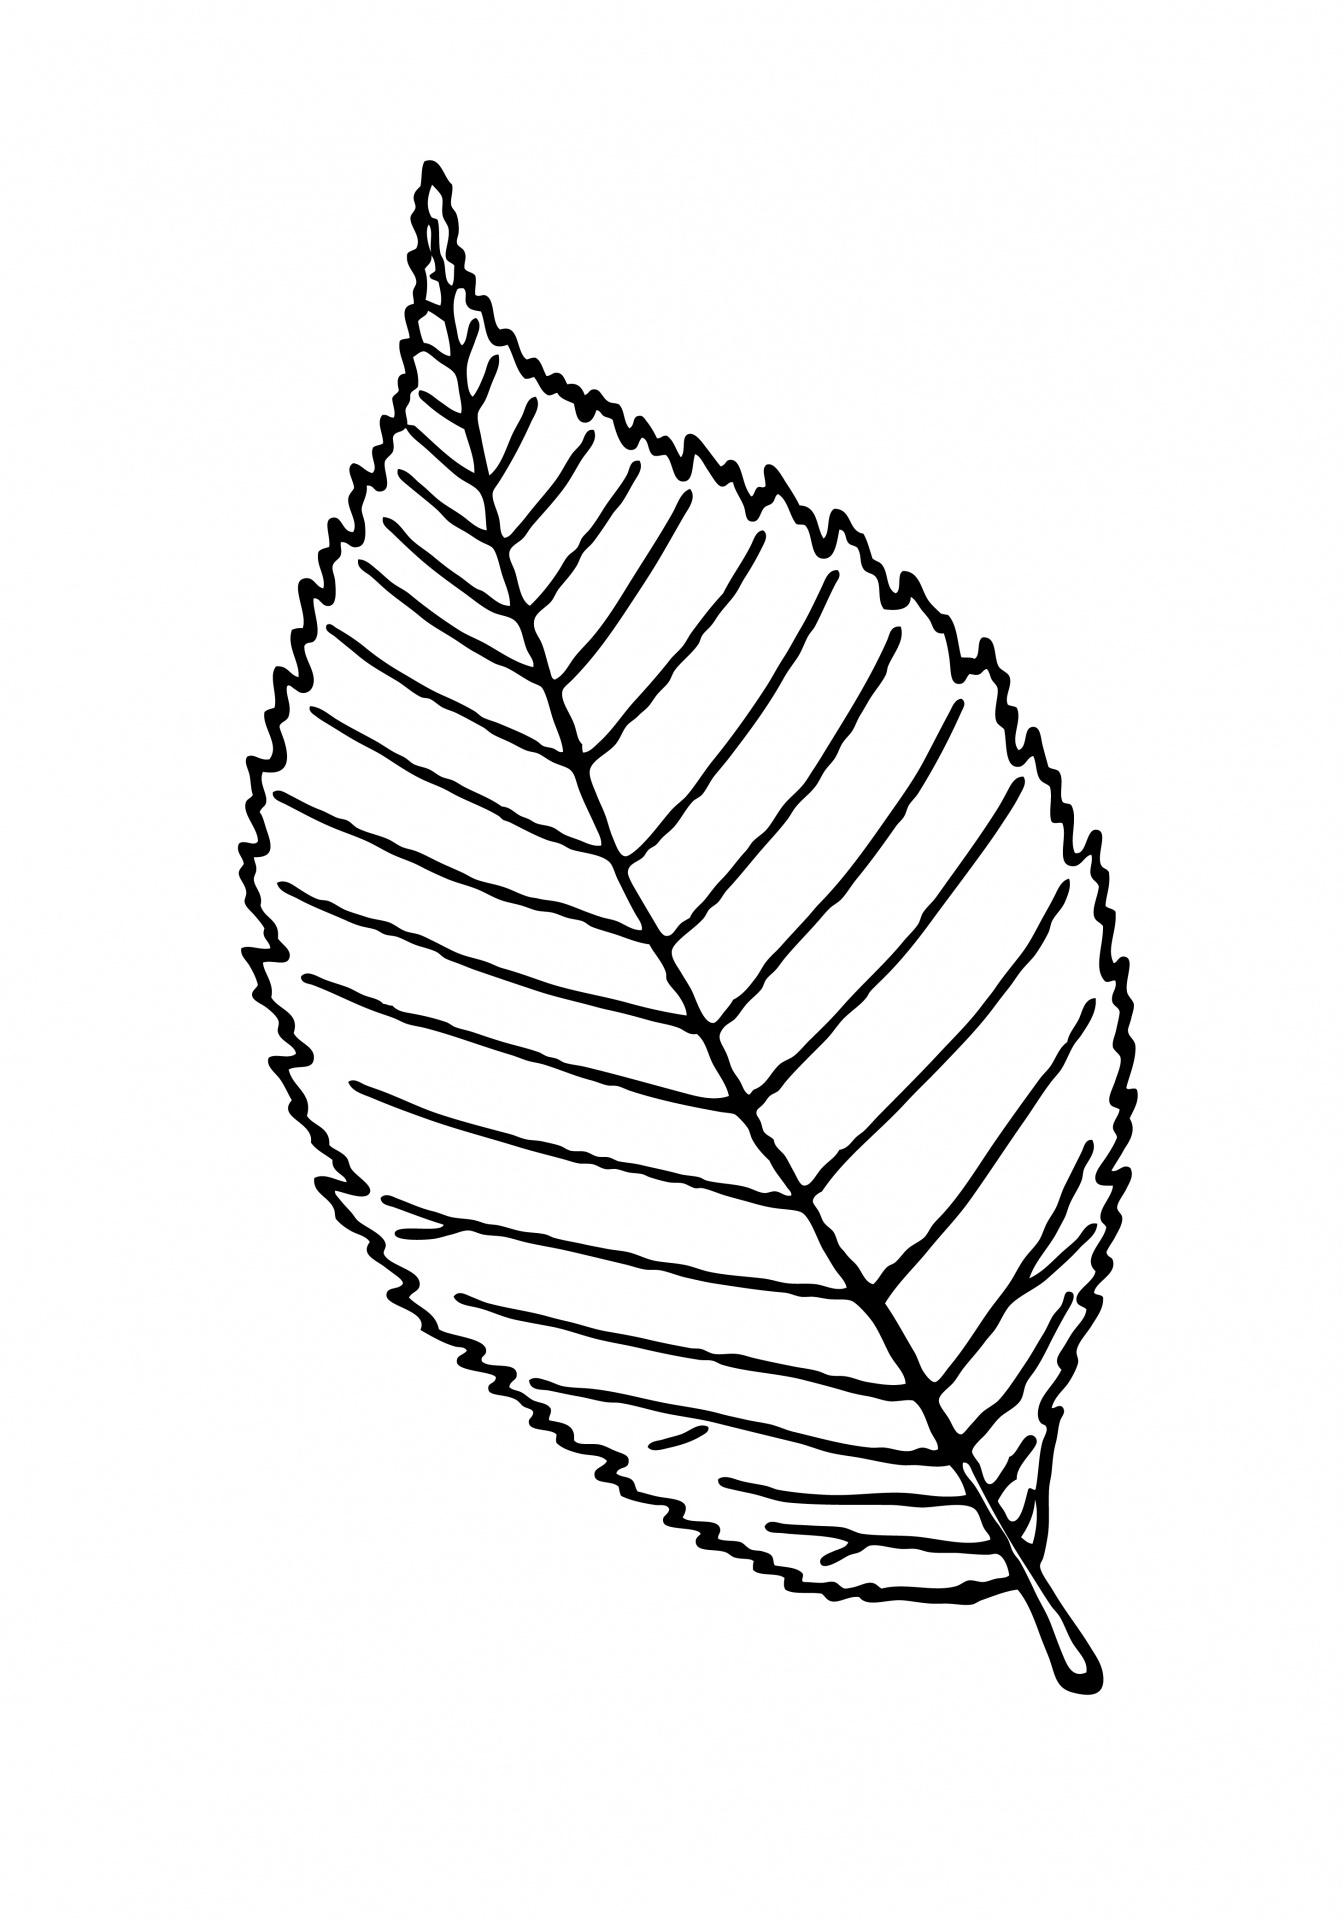 Leaf Outline Leaf Clipart Black And White Gclipart